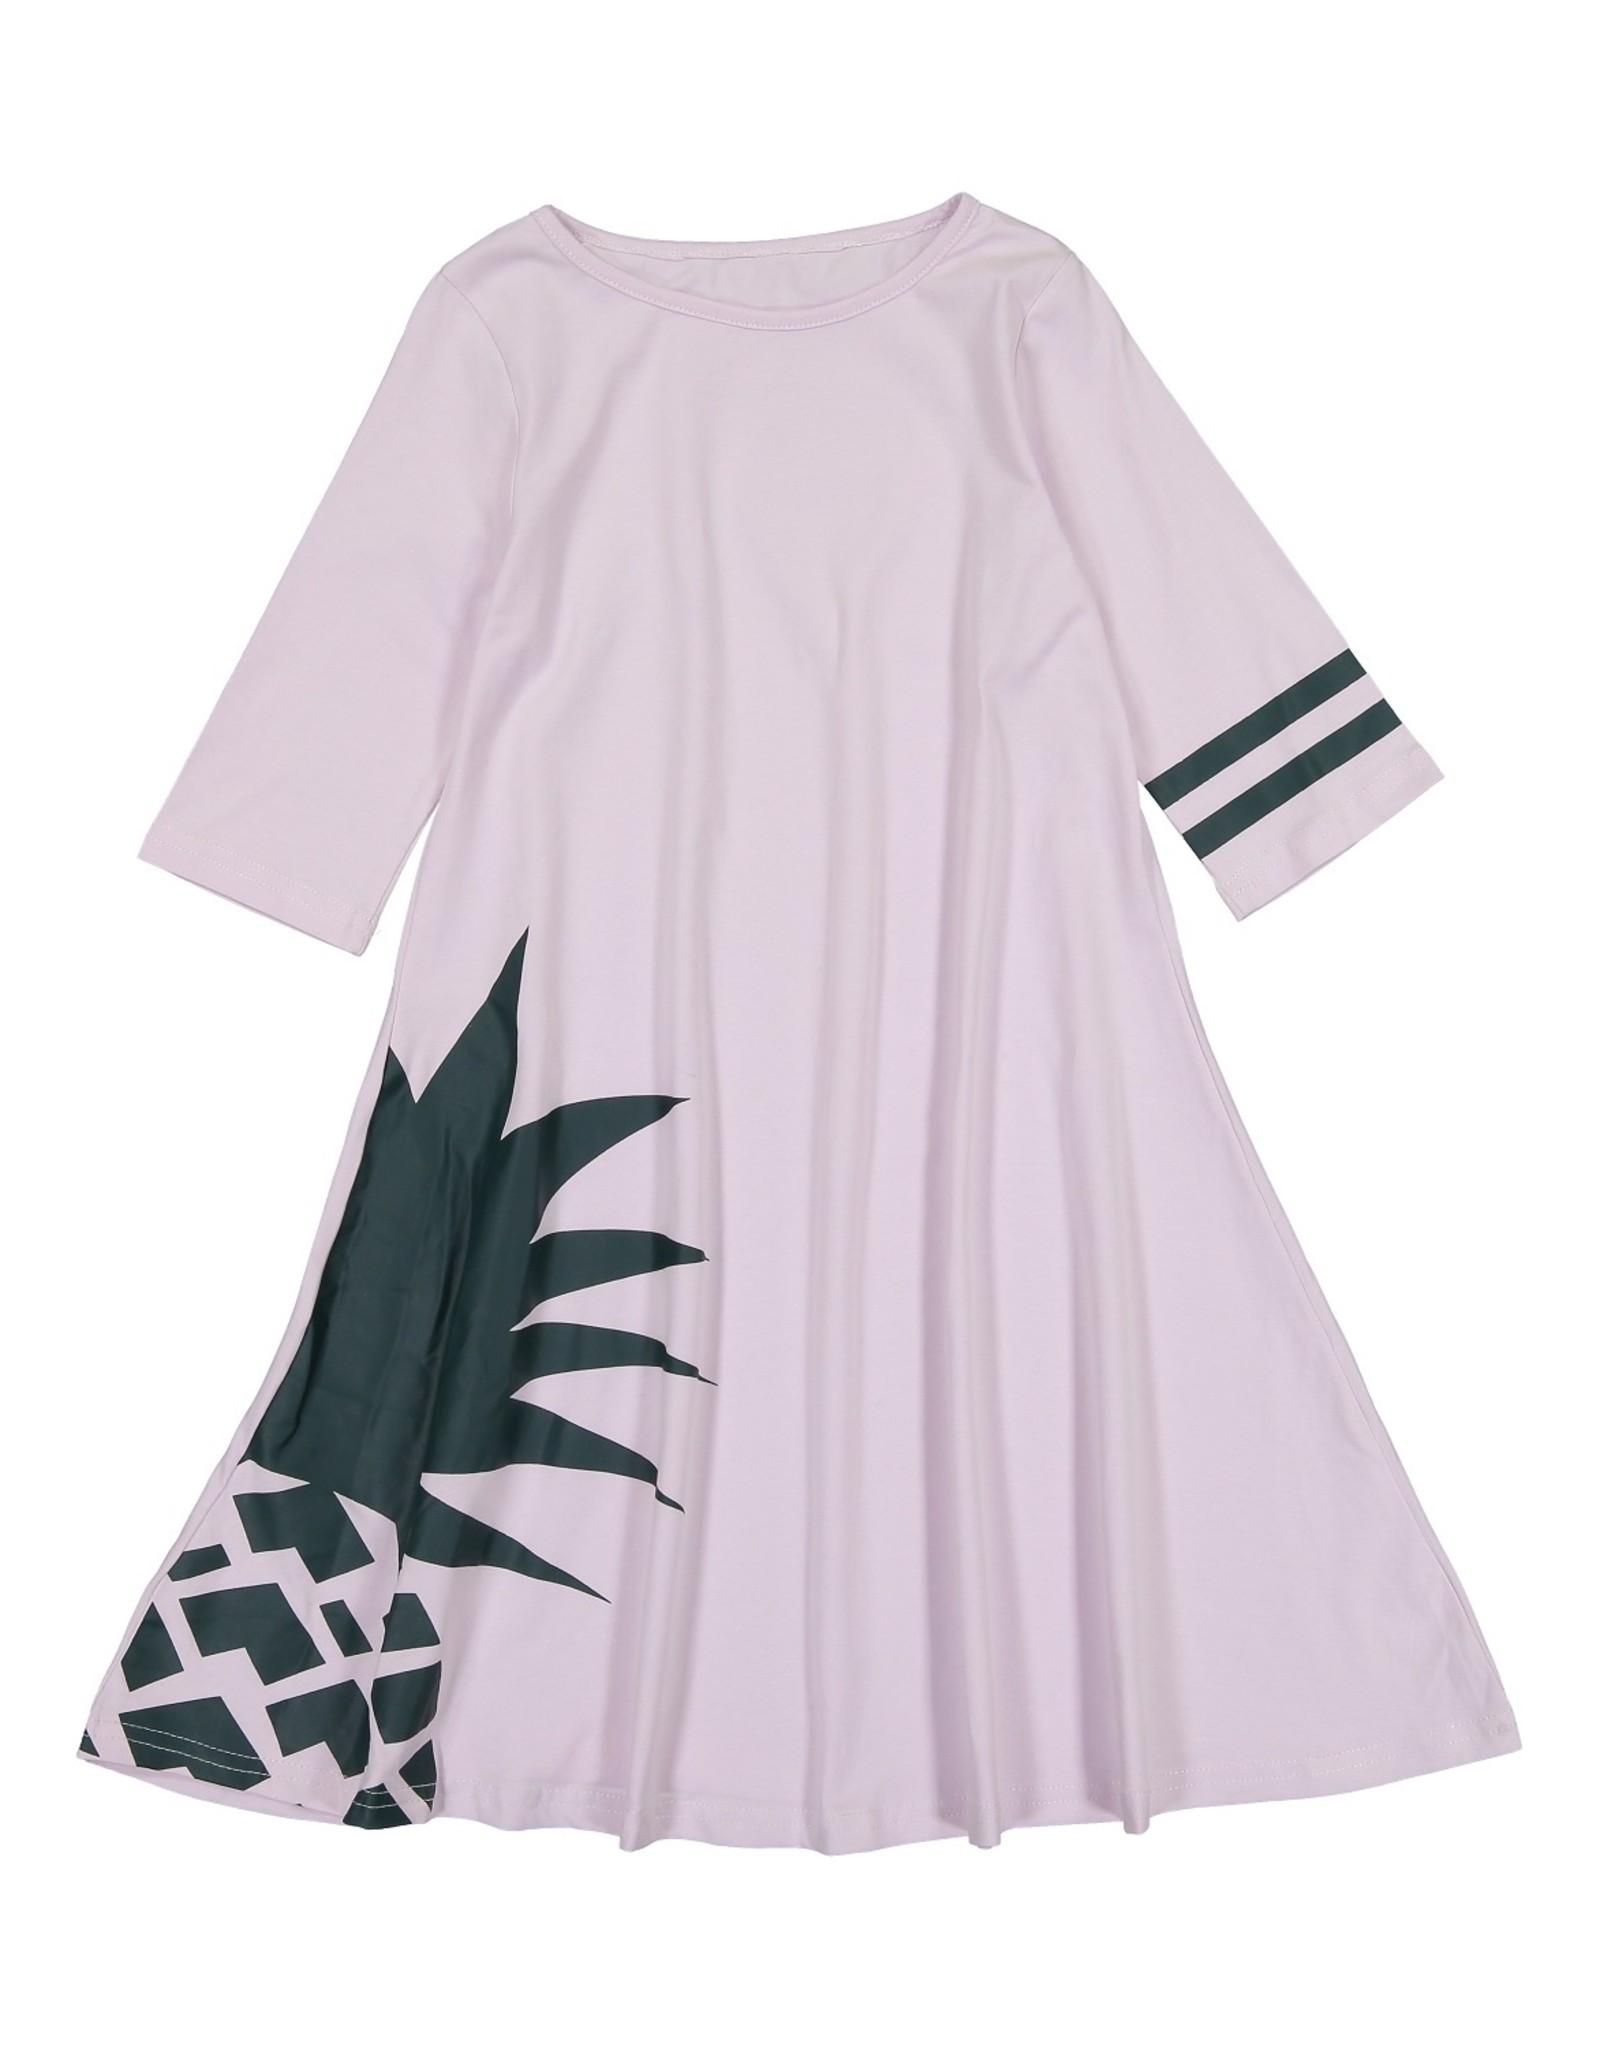 Three Bows Three Bows Pineapple Print Dress